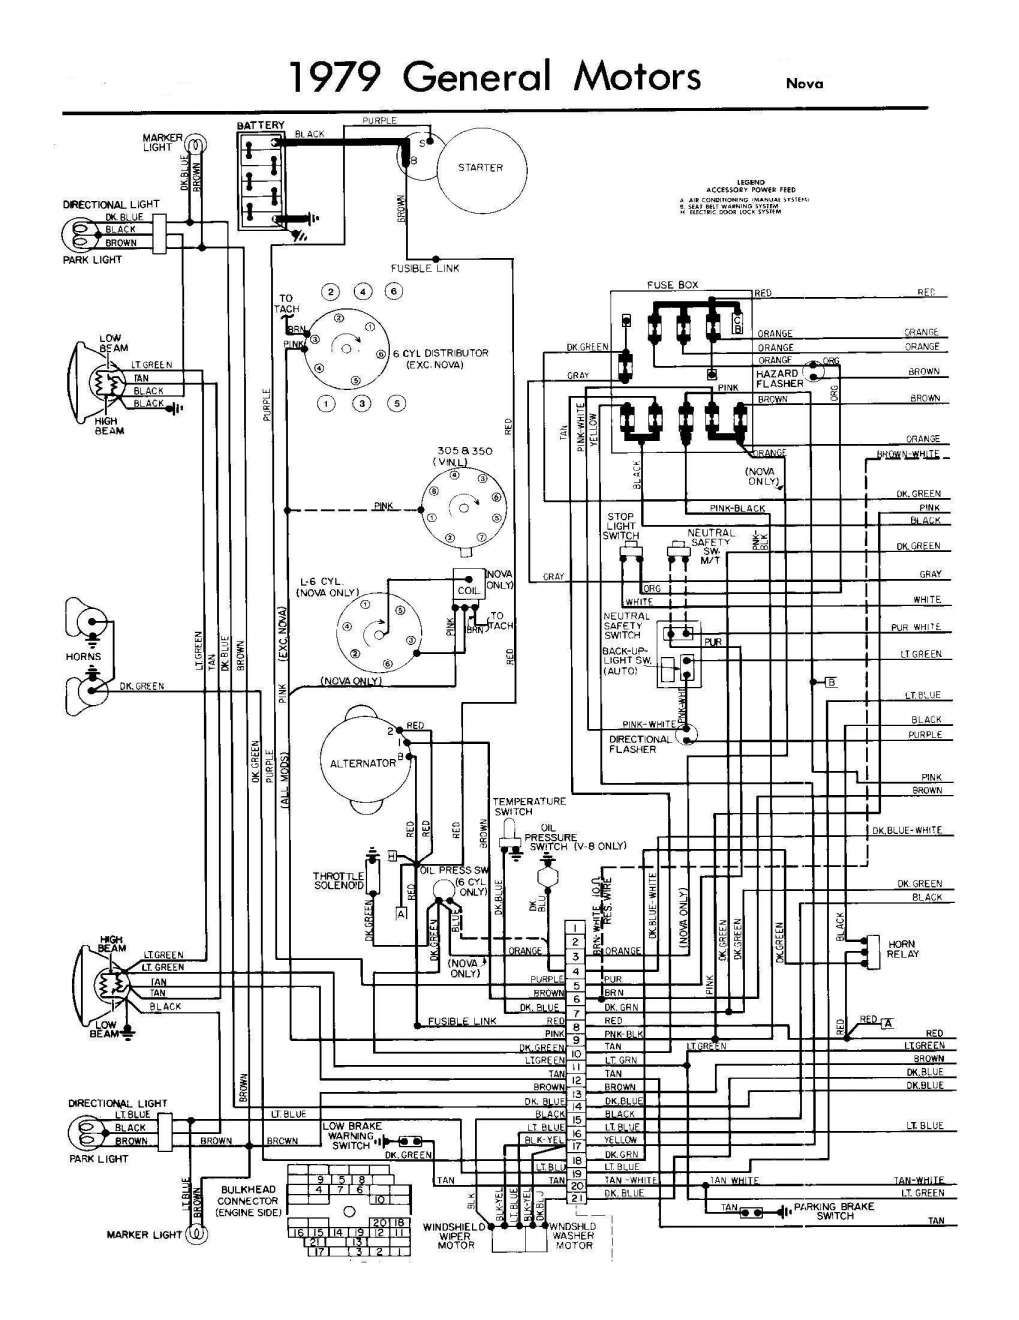 free chevy truck dash wiring diagram 12 74 chevy truck wiring diagram truck diagram in 2020  with  12 74 chevy truck wiring diagram